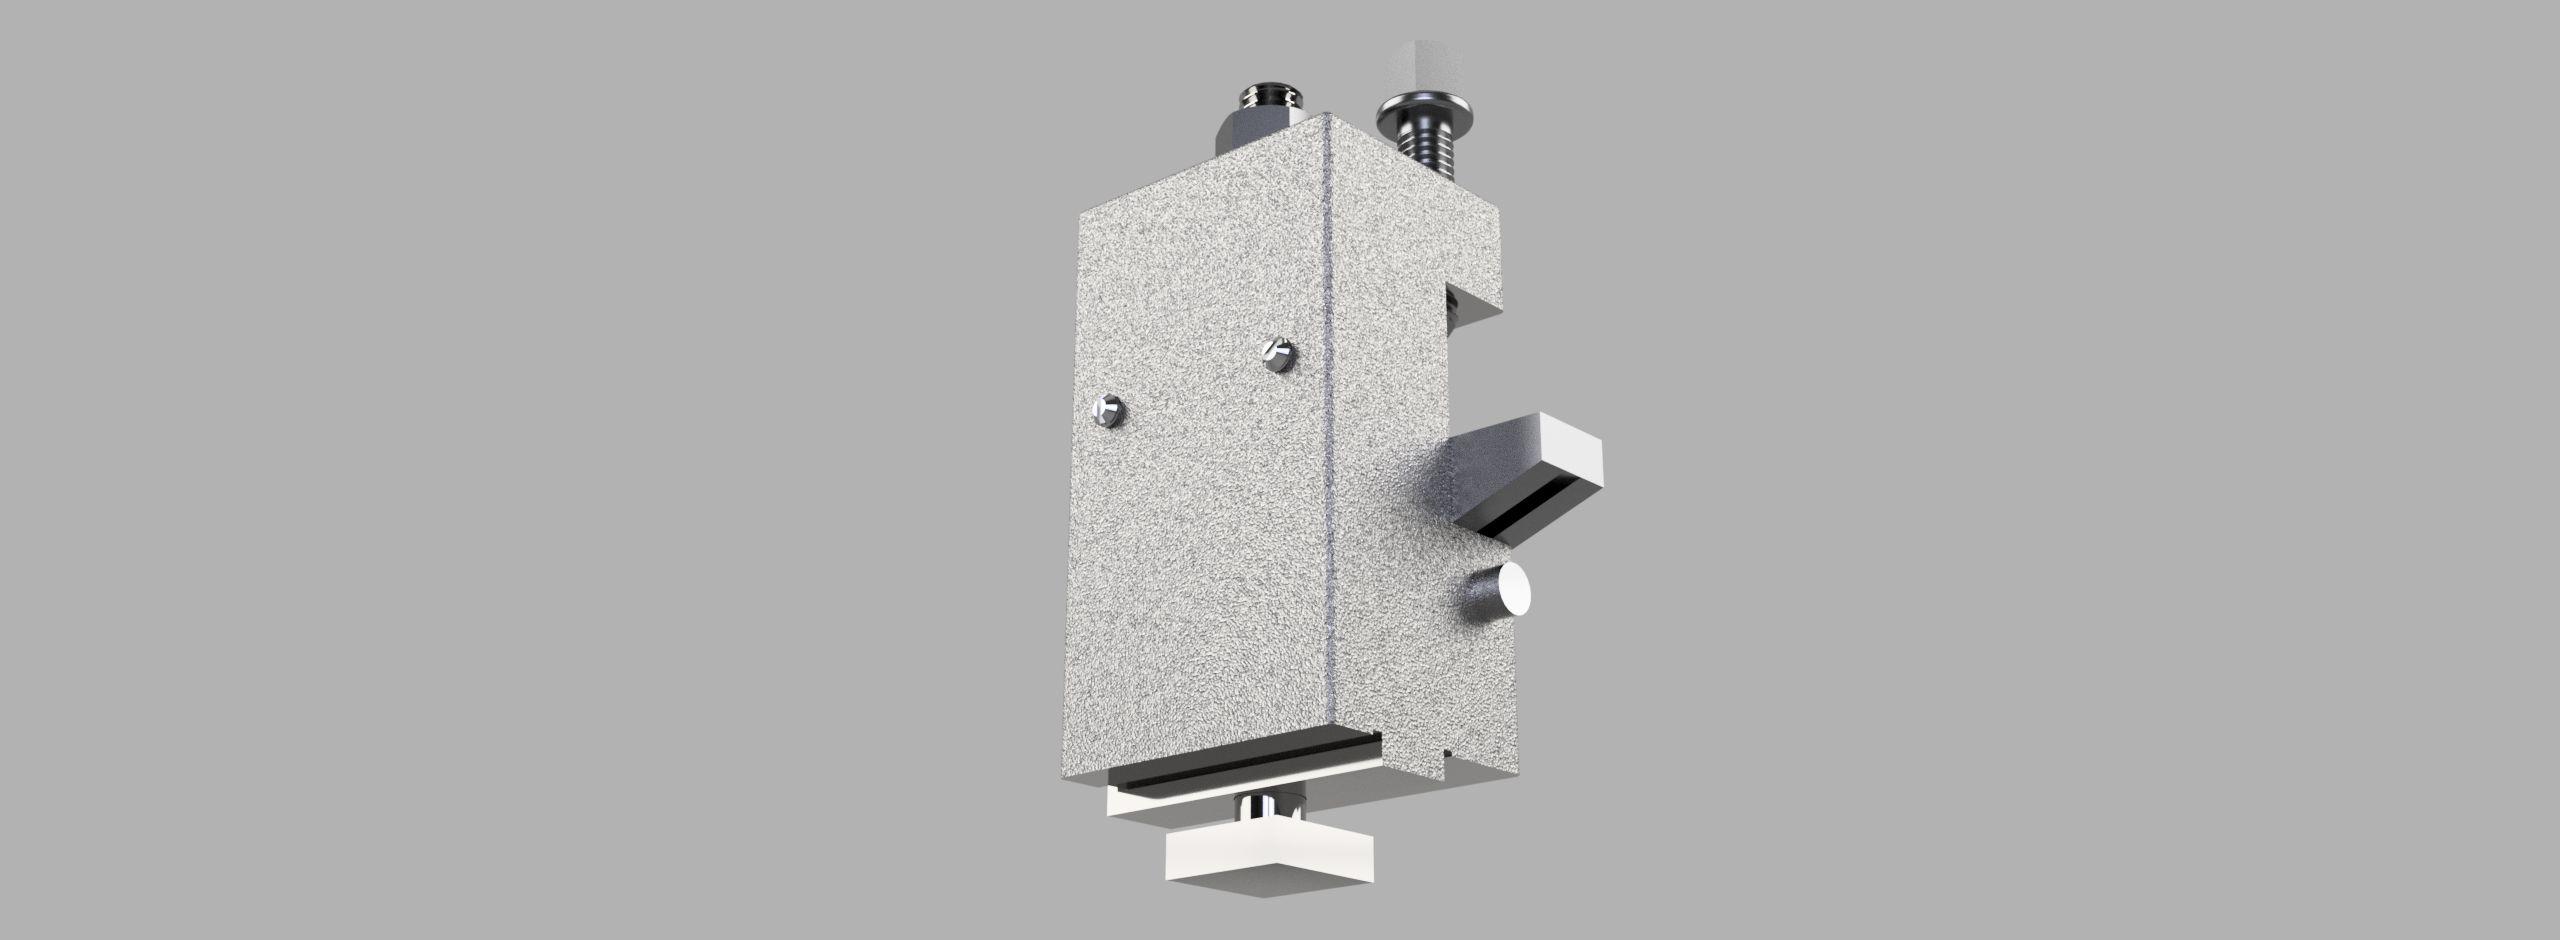 Tool-post-v12-c-3500-3500